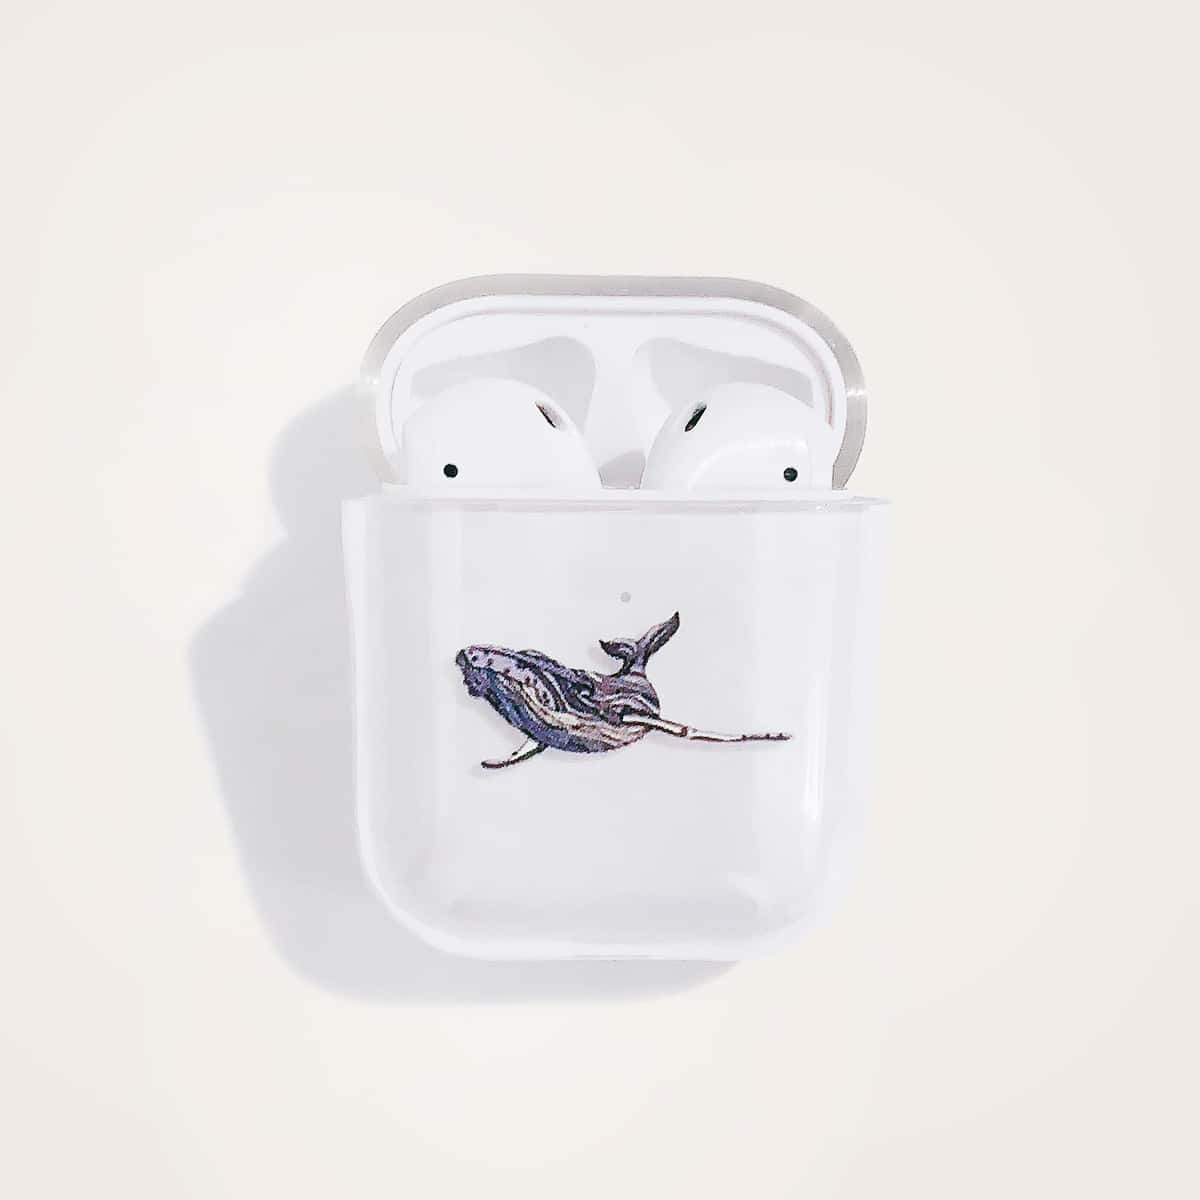 SHEIN / 1 Stück Transparente Airpods Hülle mit Wal Muster